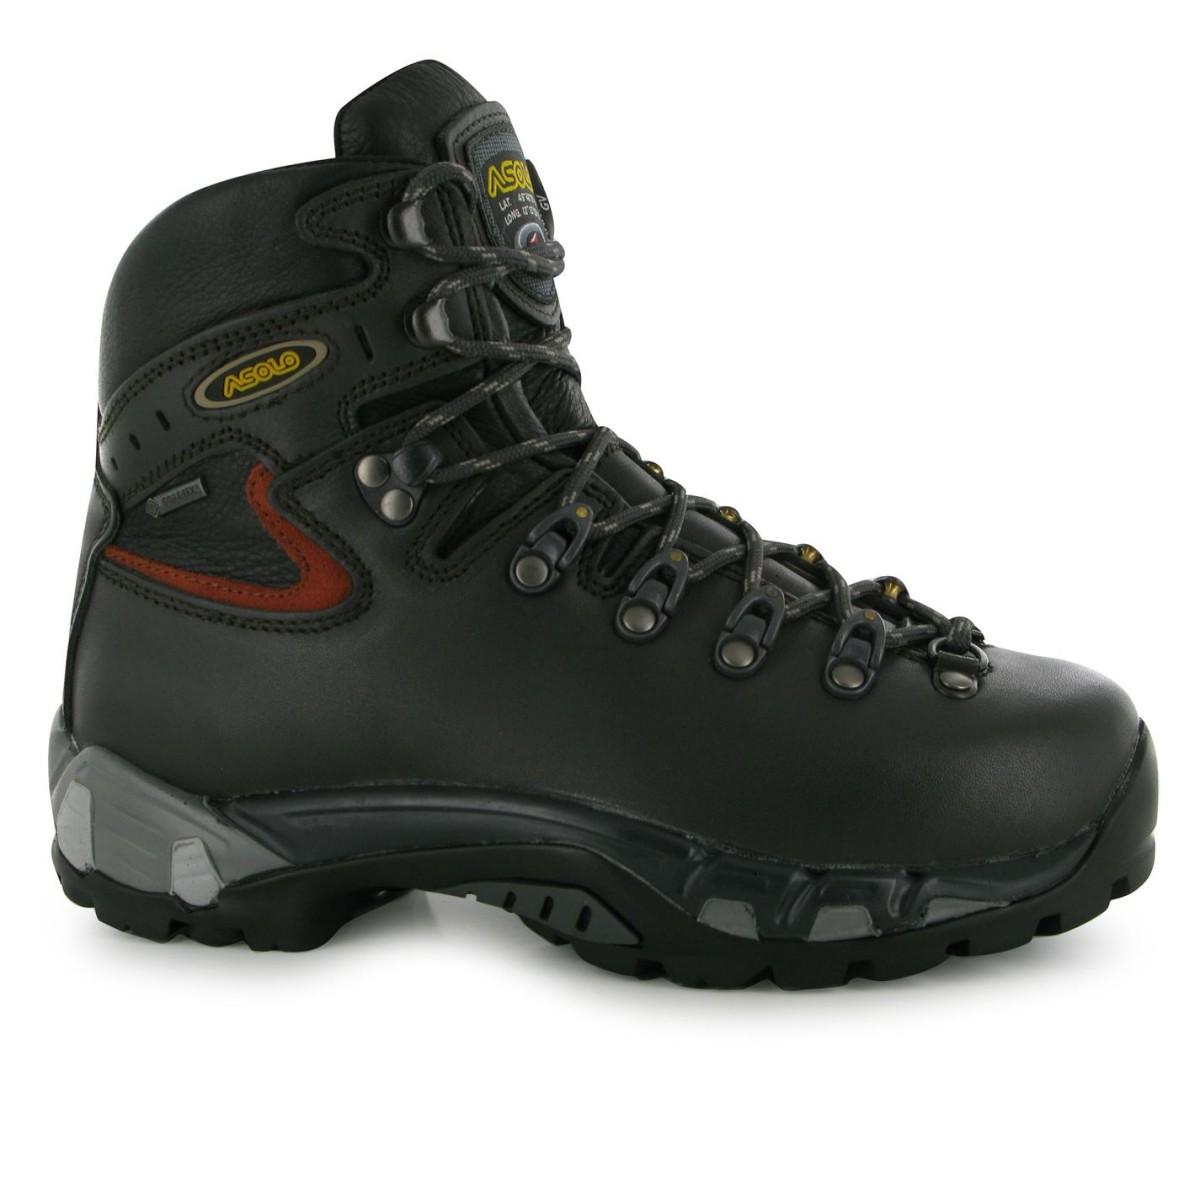 hot sale online dde21 4adb4 Power Matic 200 - scarpe da trekking uomo - dark-graphite